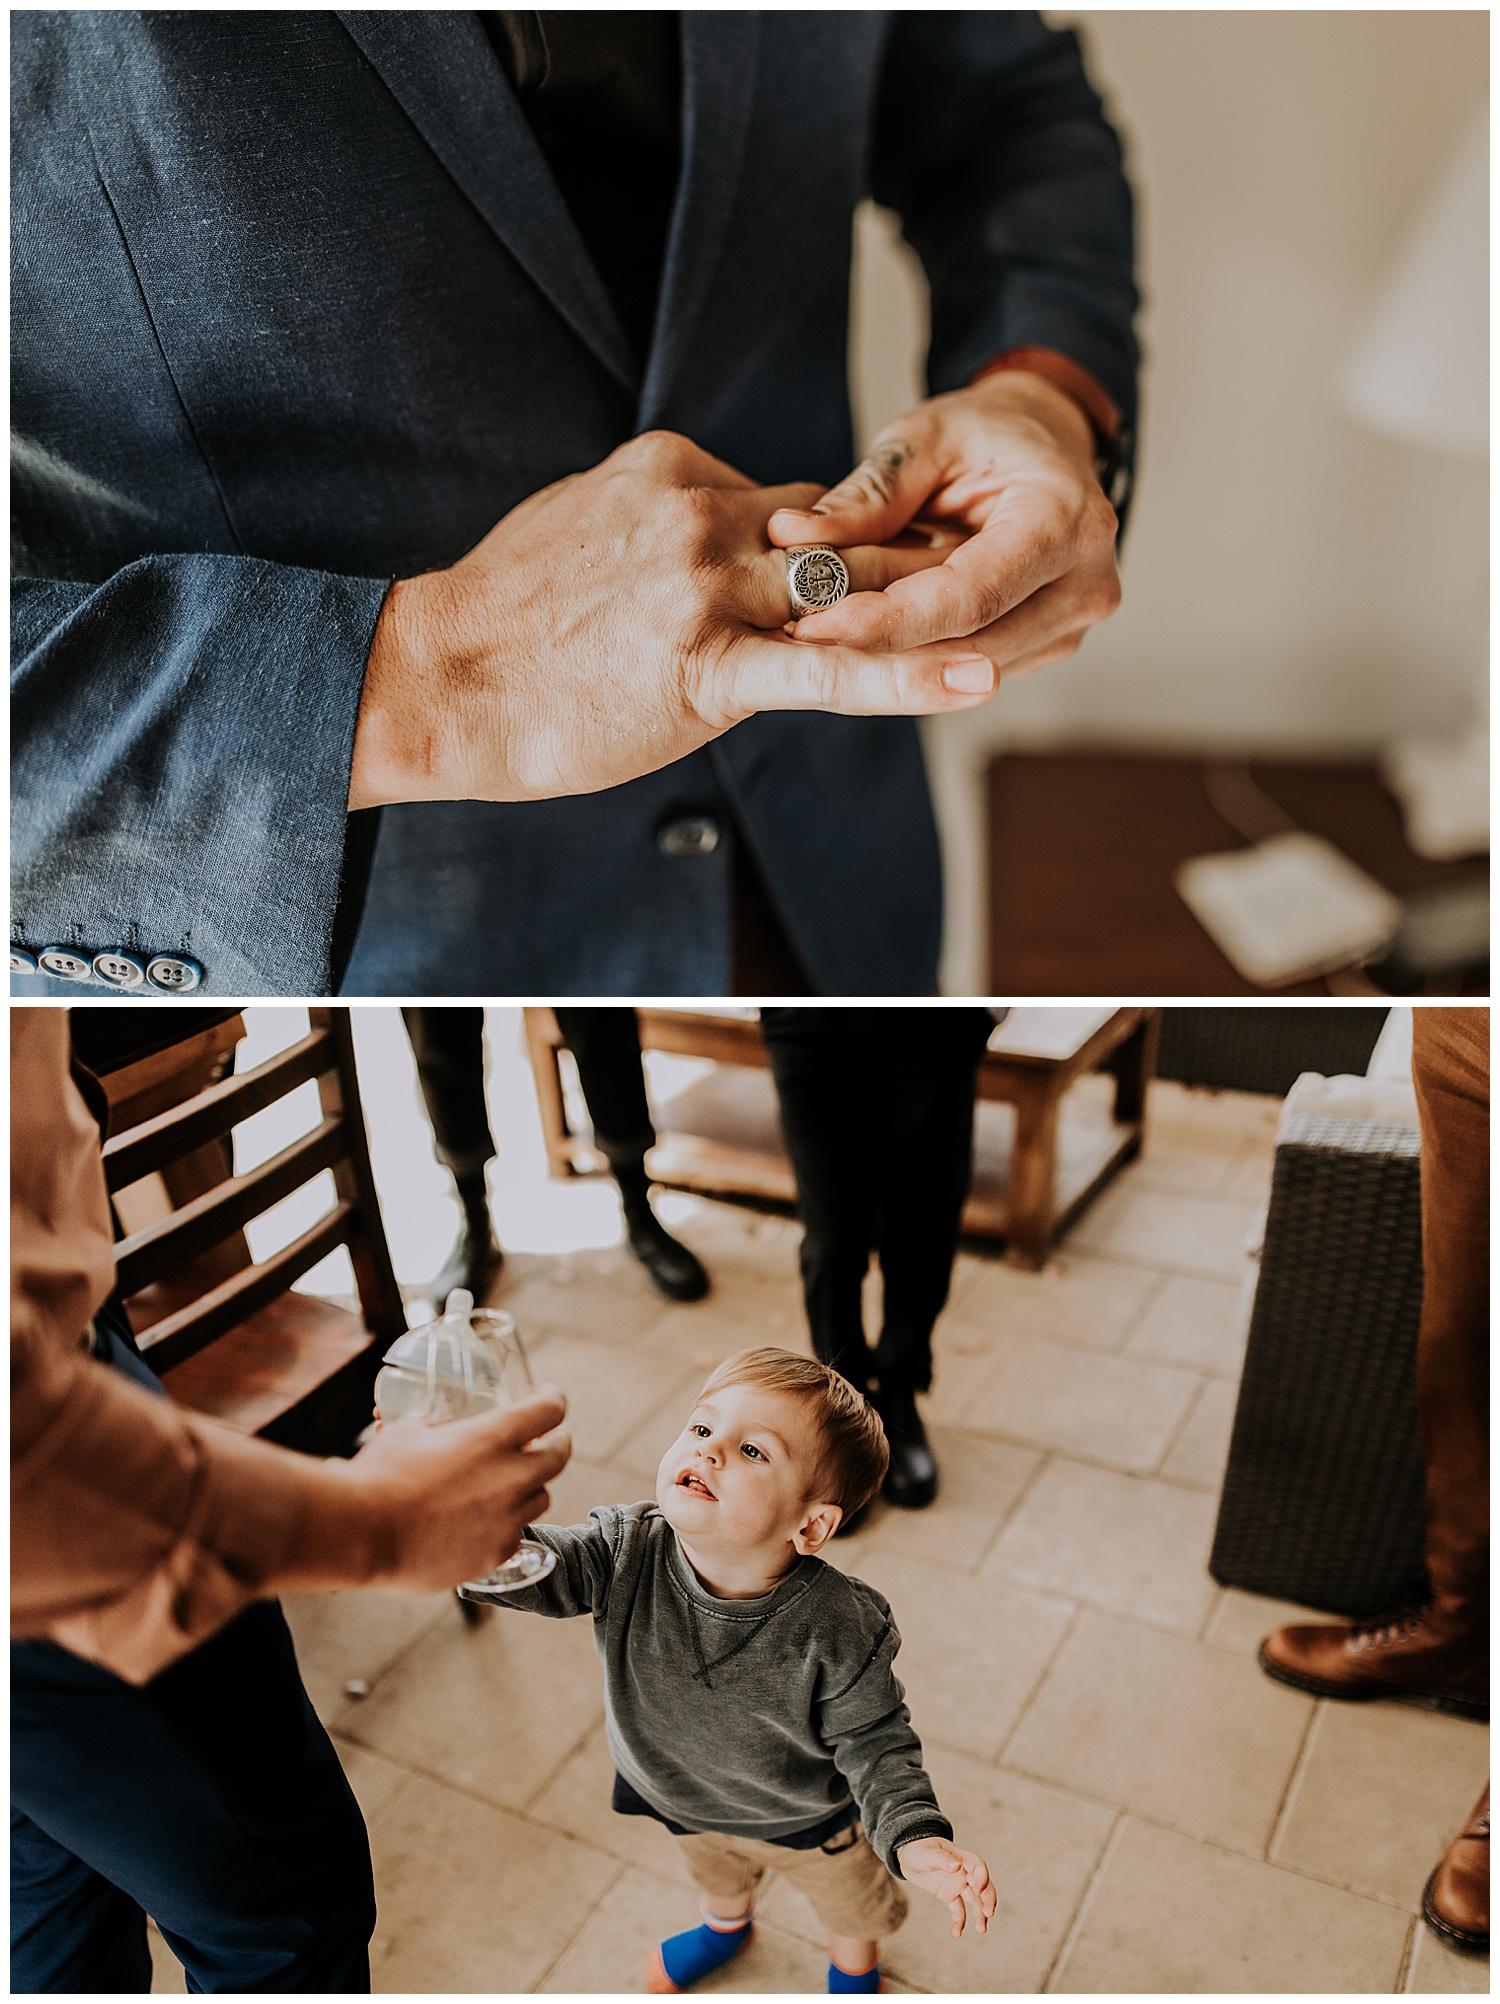 katie_jake_keeper_creative_wedding_photographer_06.JPG